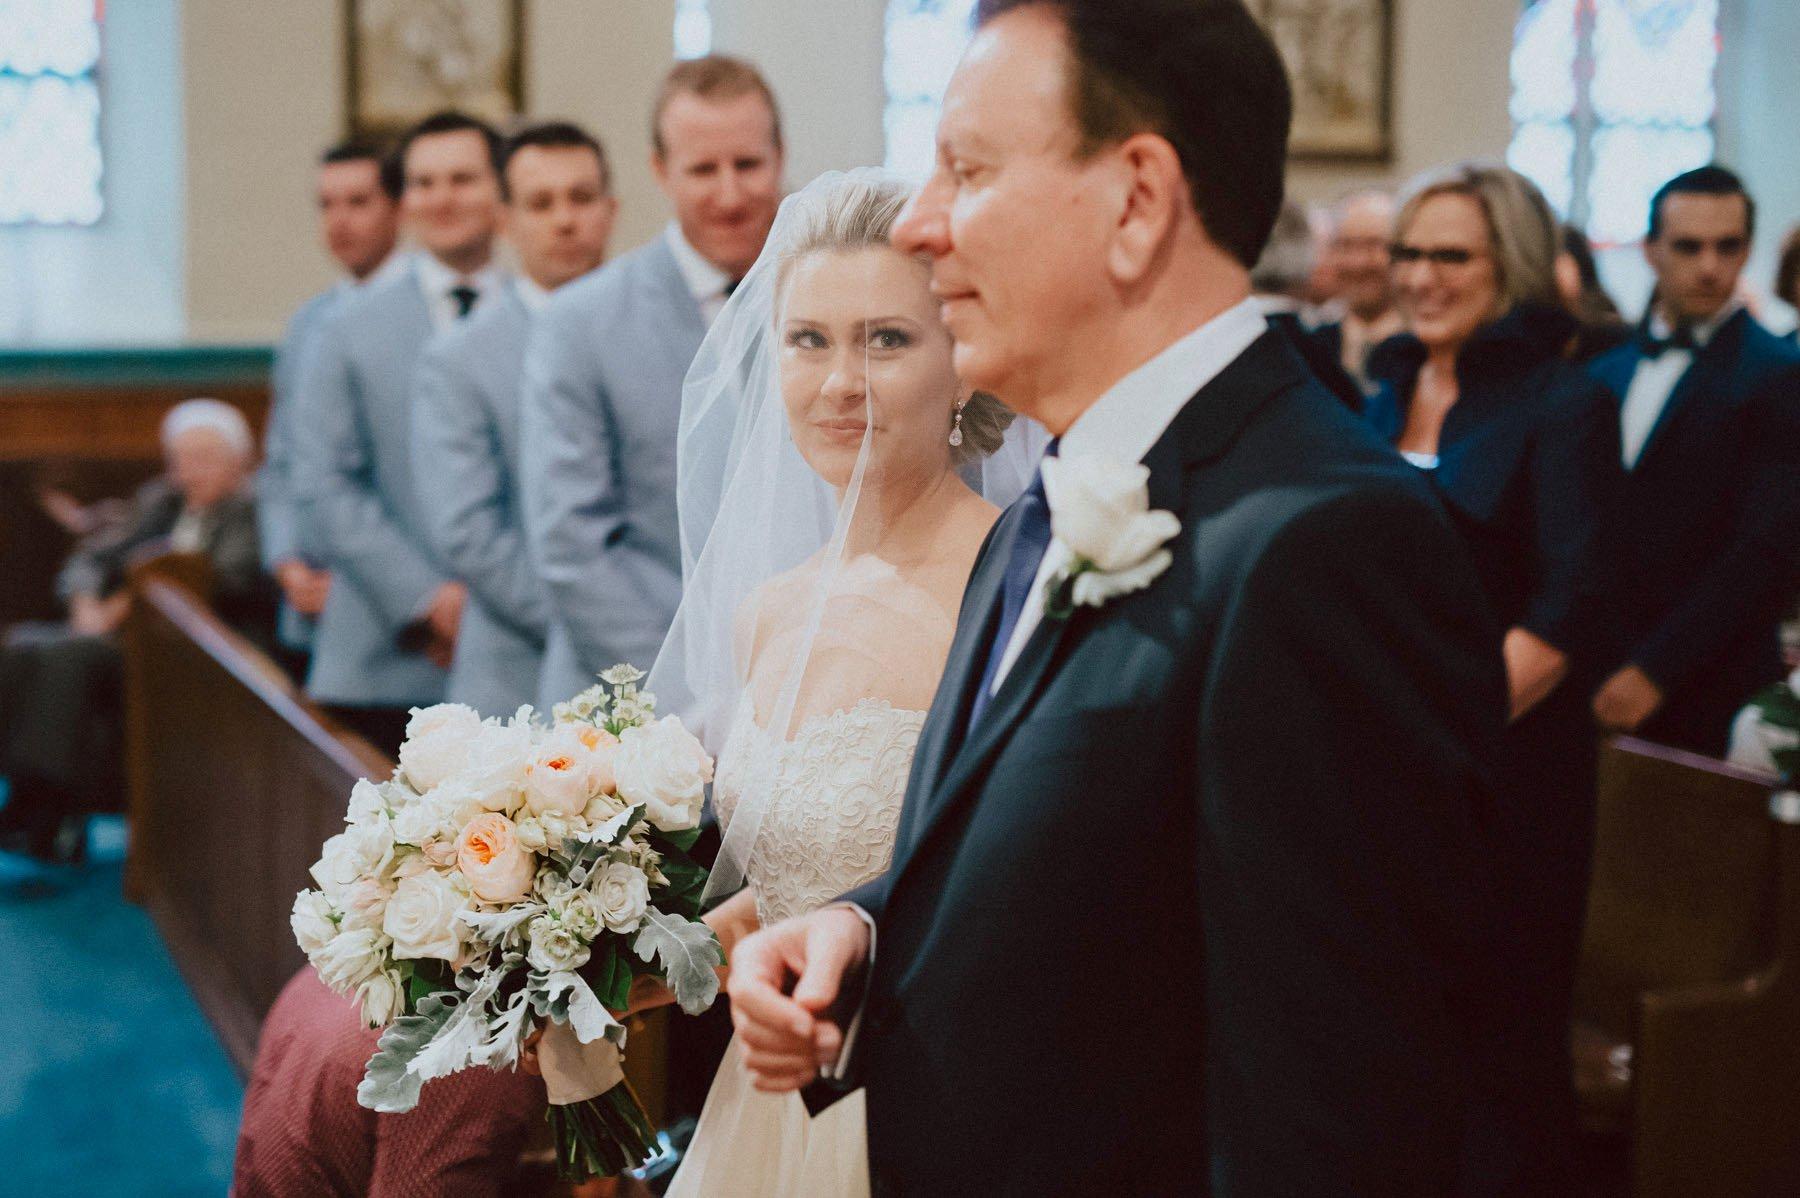 greenville-country-club-wedding-46.jpg